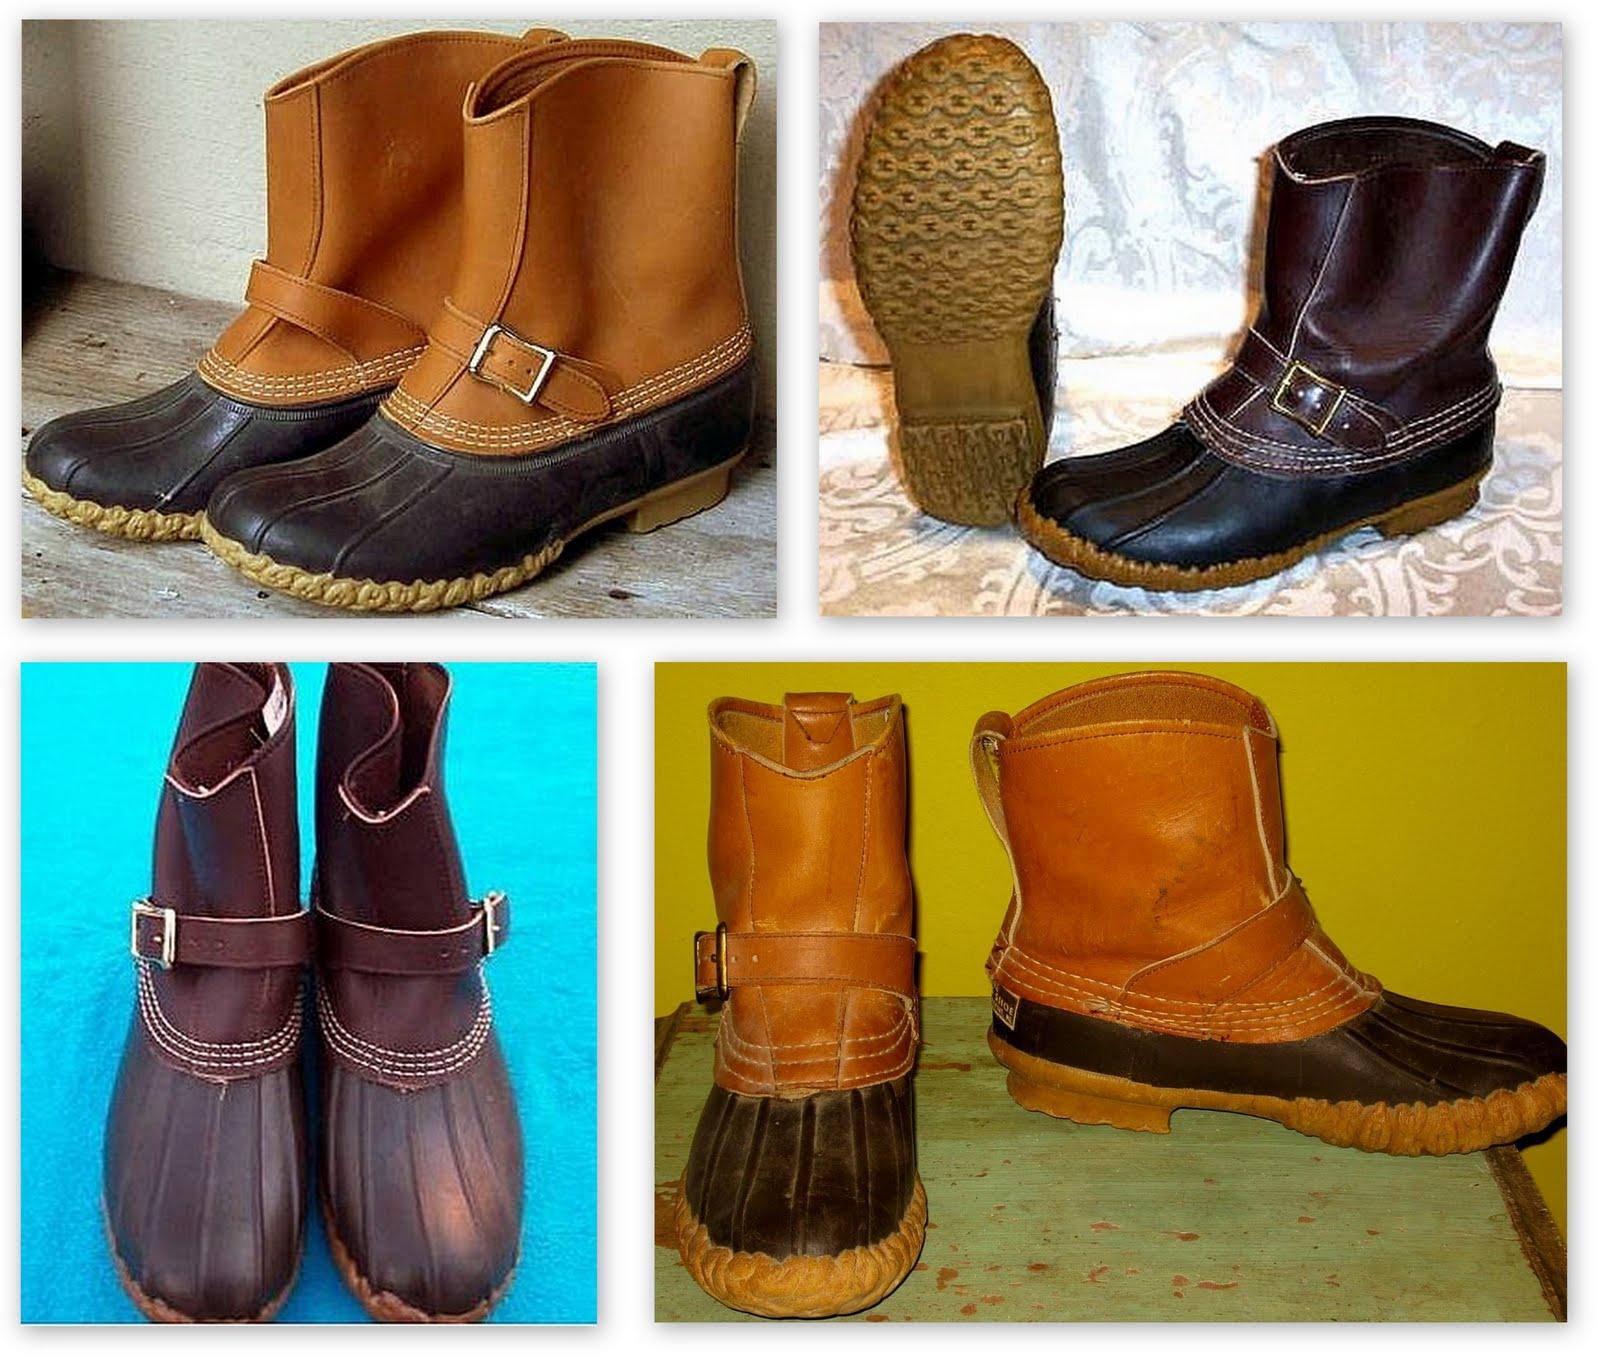 L L Bean Lounger Boot Dreams Of Perfection Endorsement